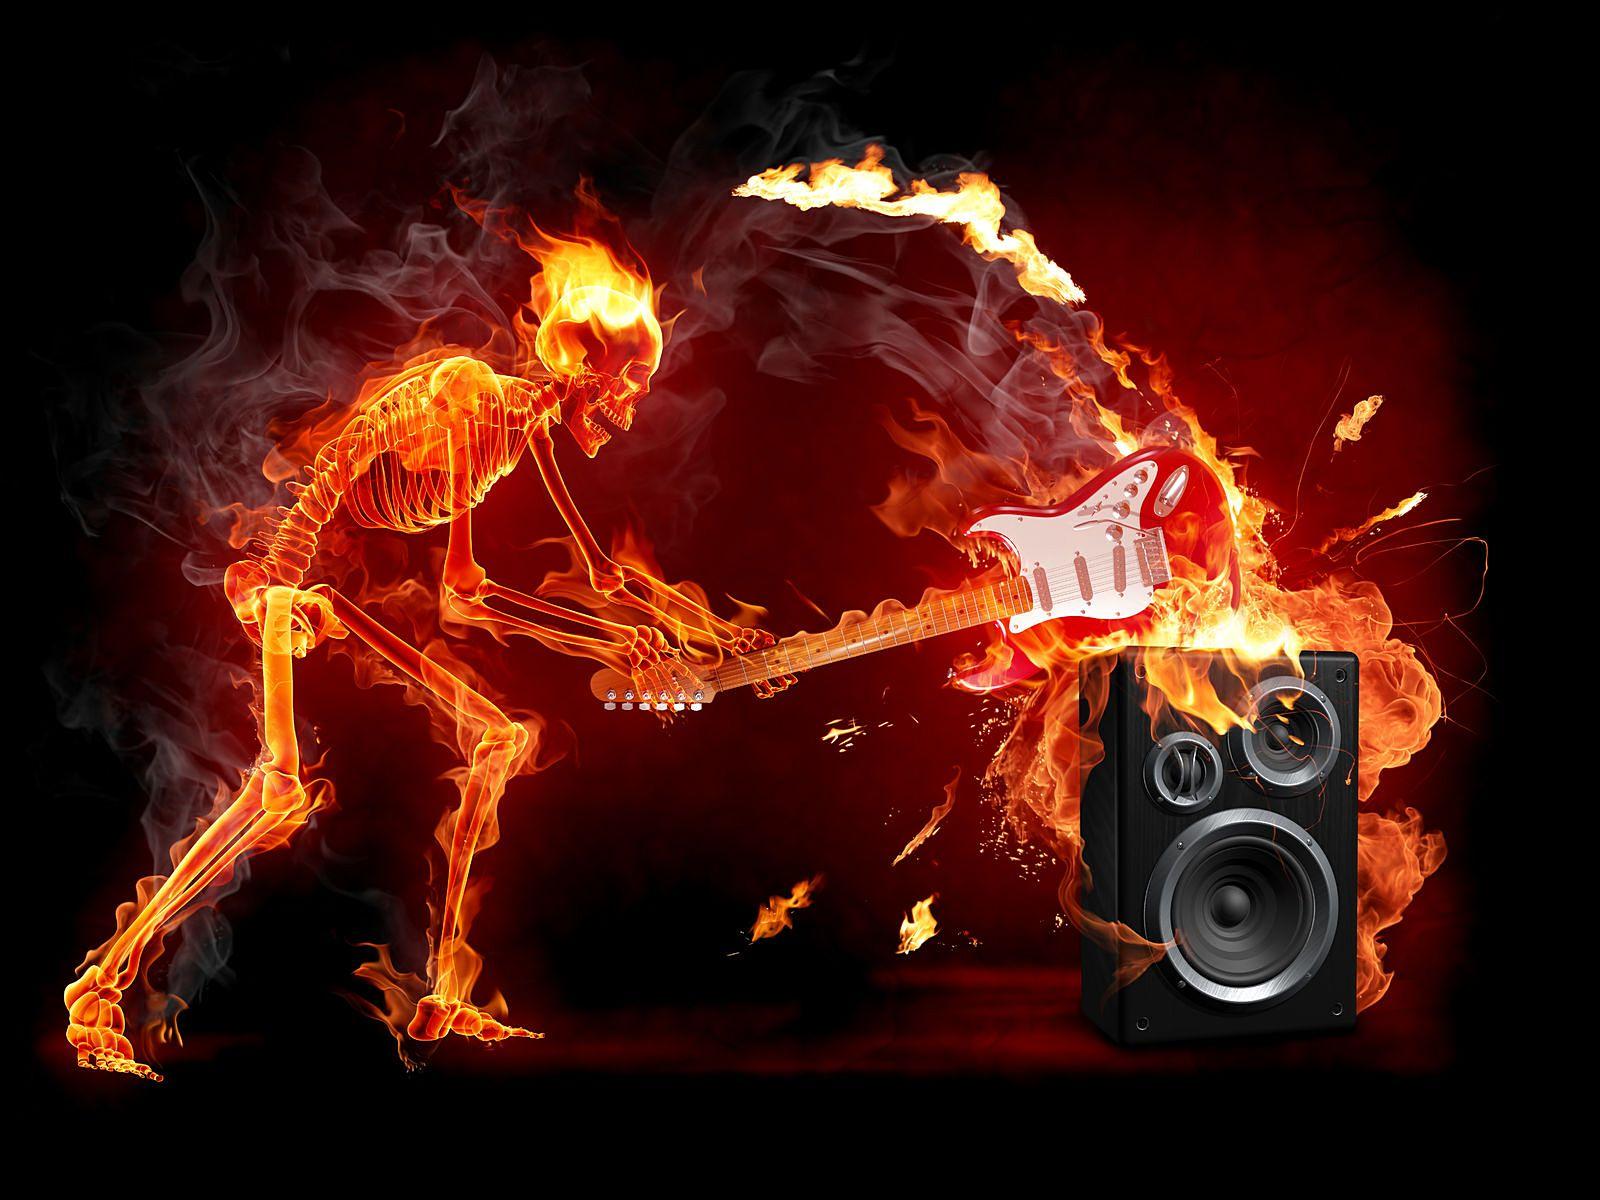 Electric Guitar Wallpaper   Wallpaper High Definition High Quality 1600x1200